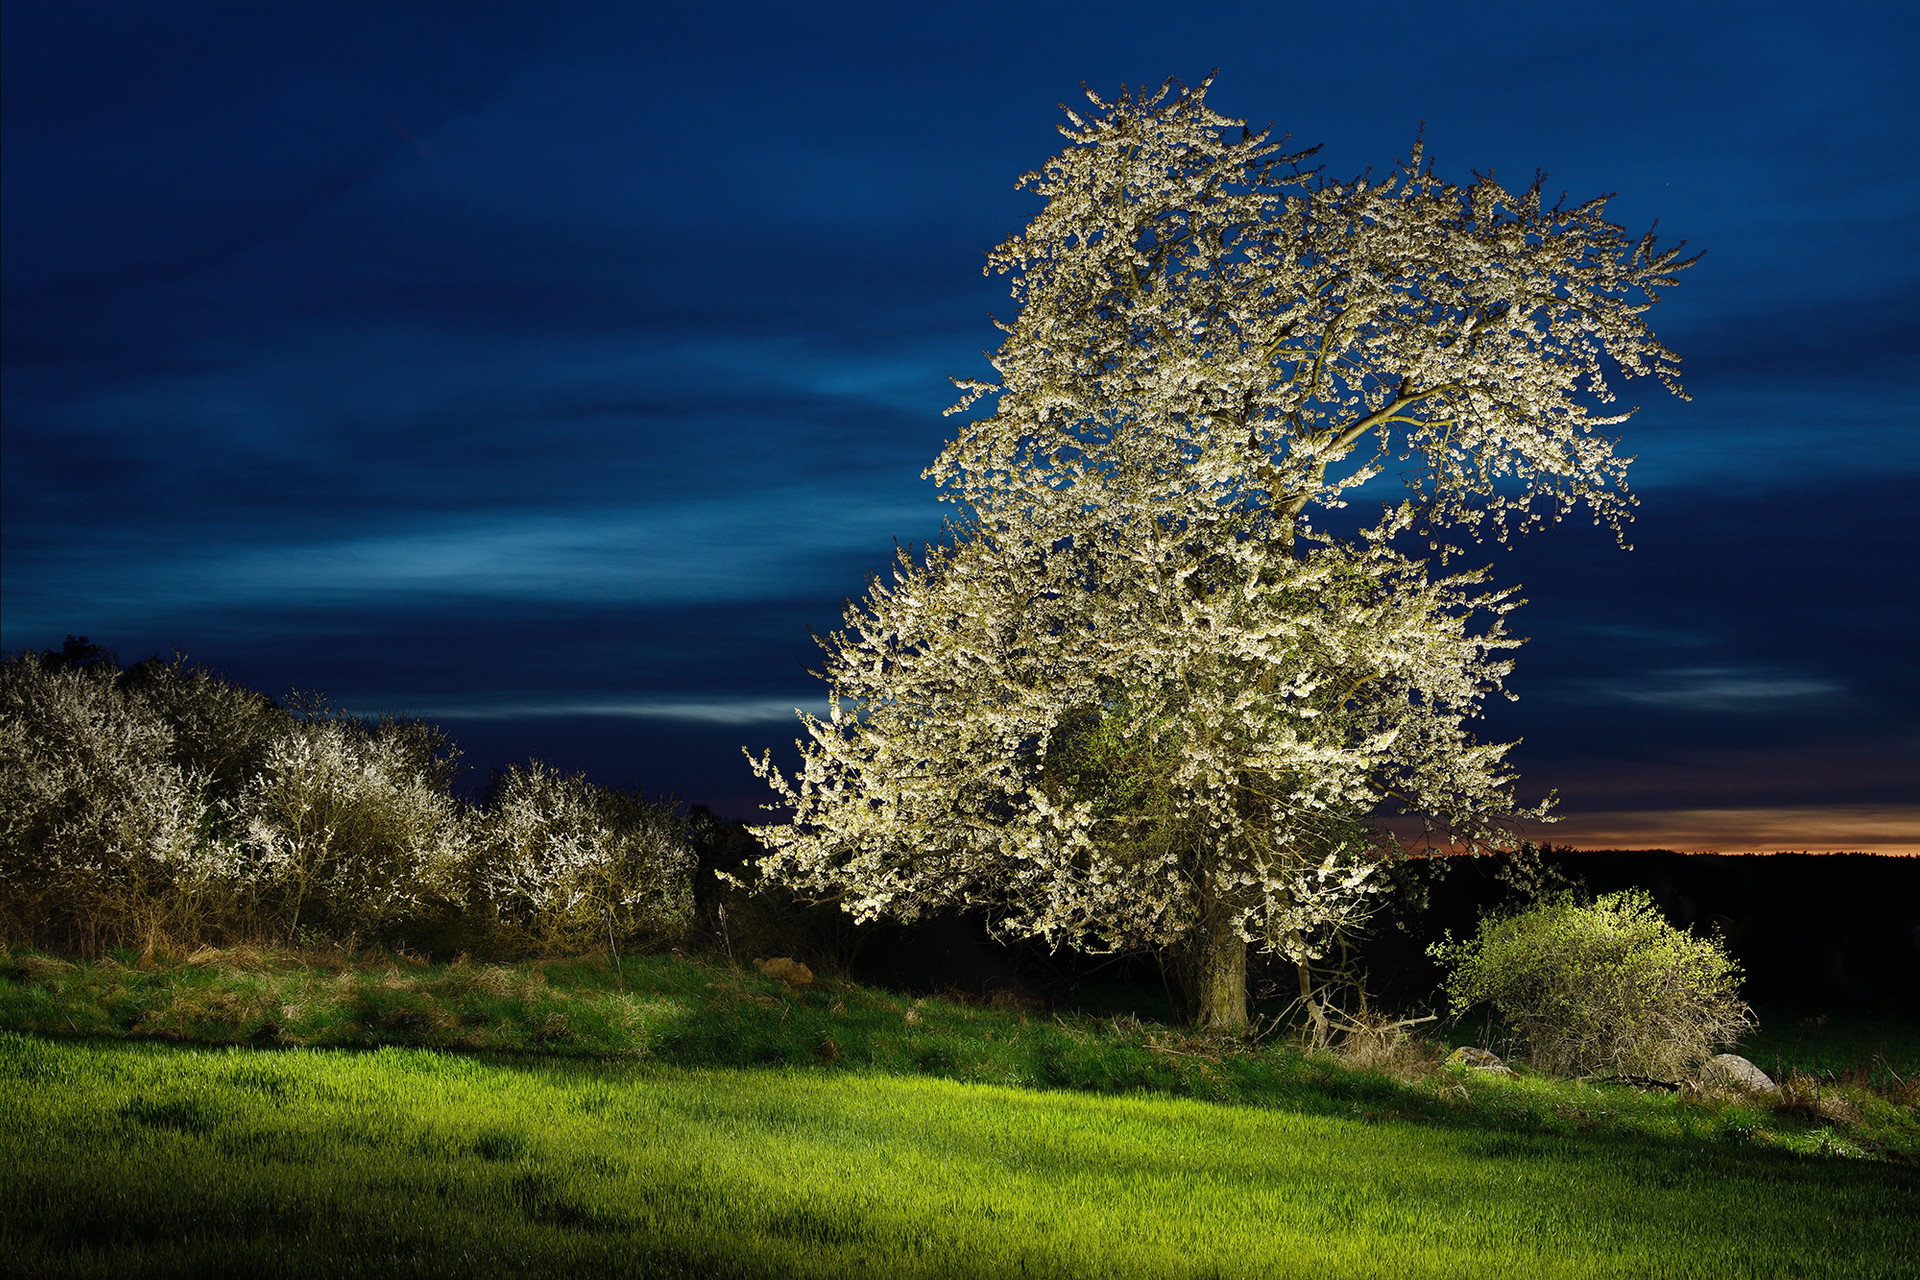 Kvetoucí_strom.jpg